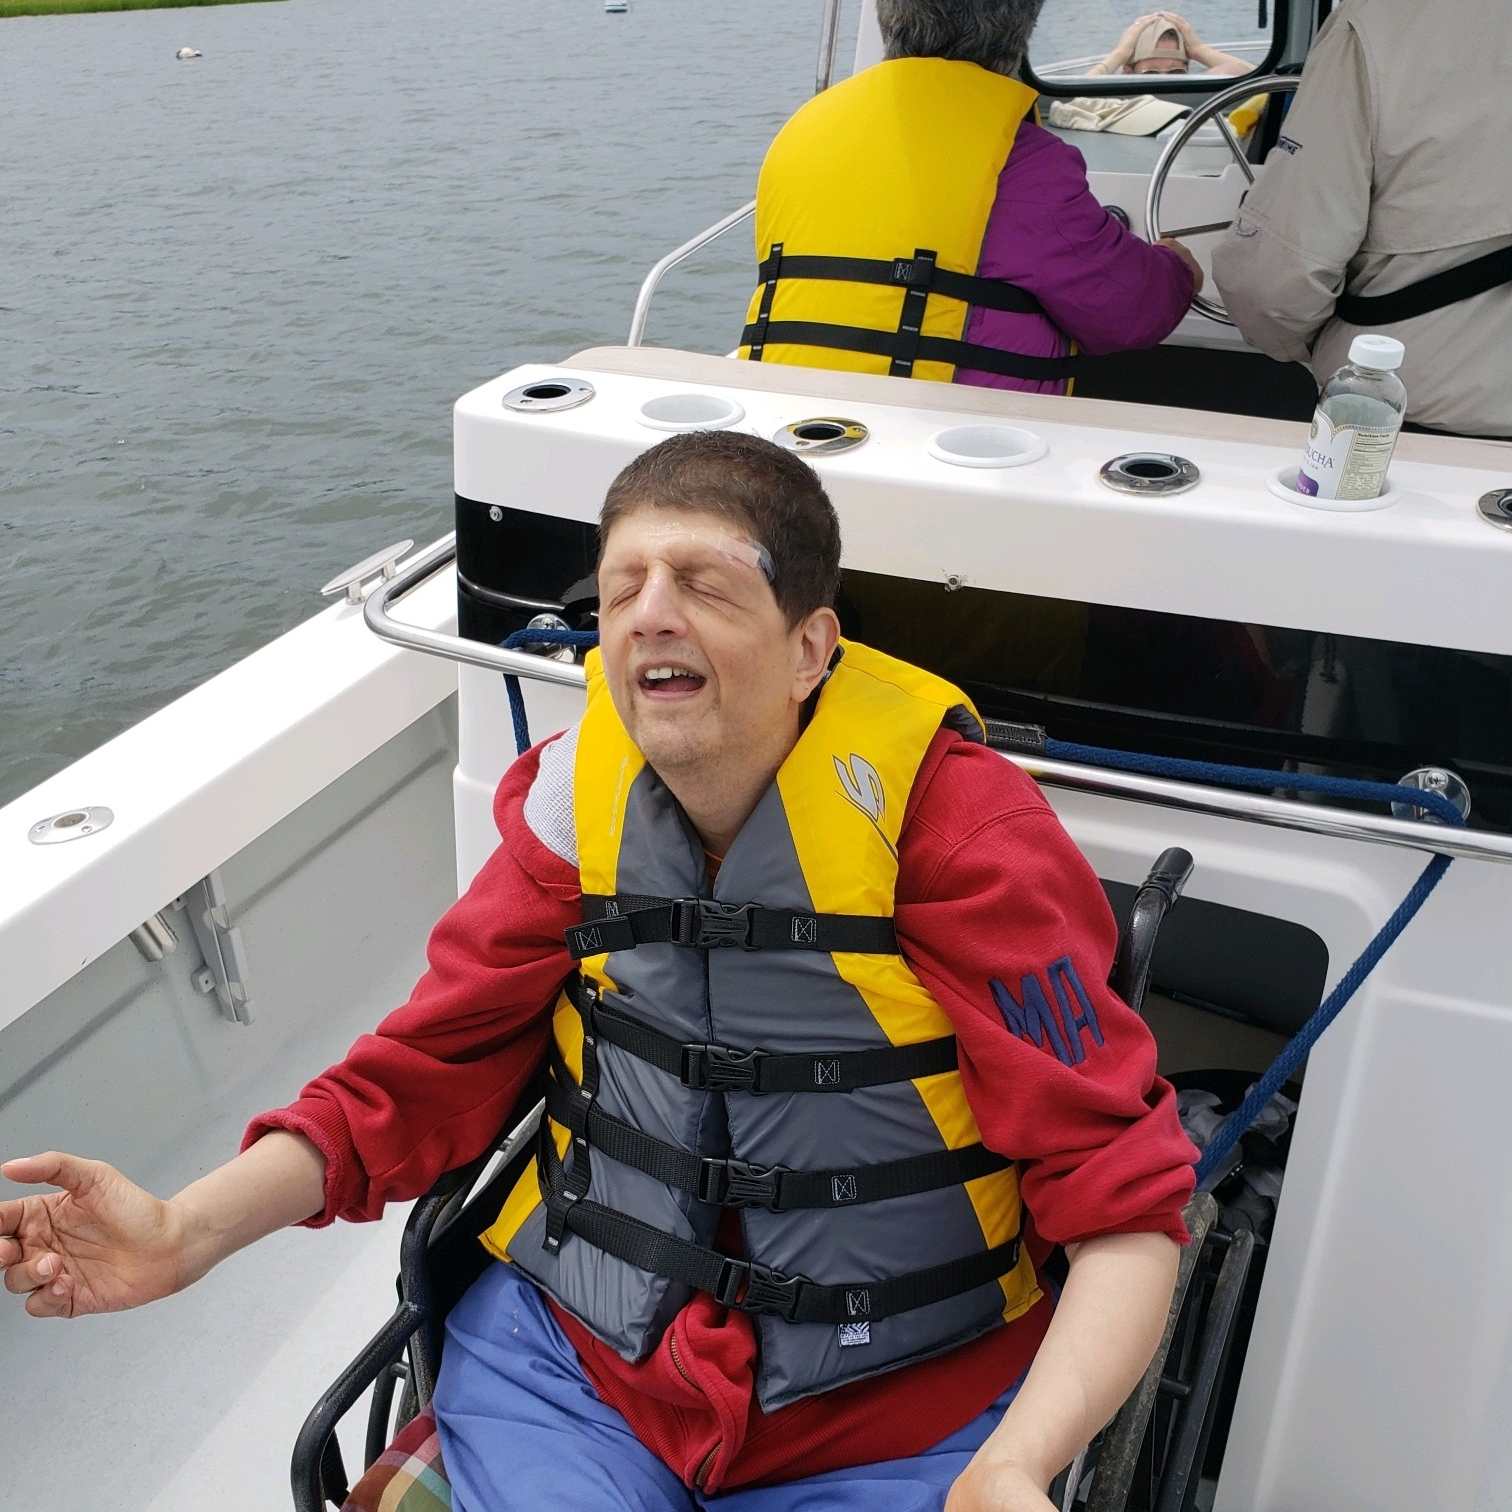 Peter enjoying the boat